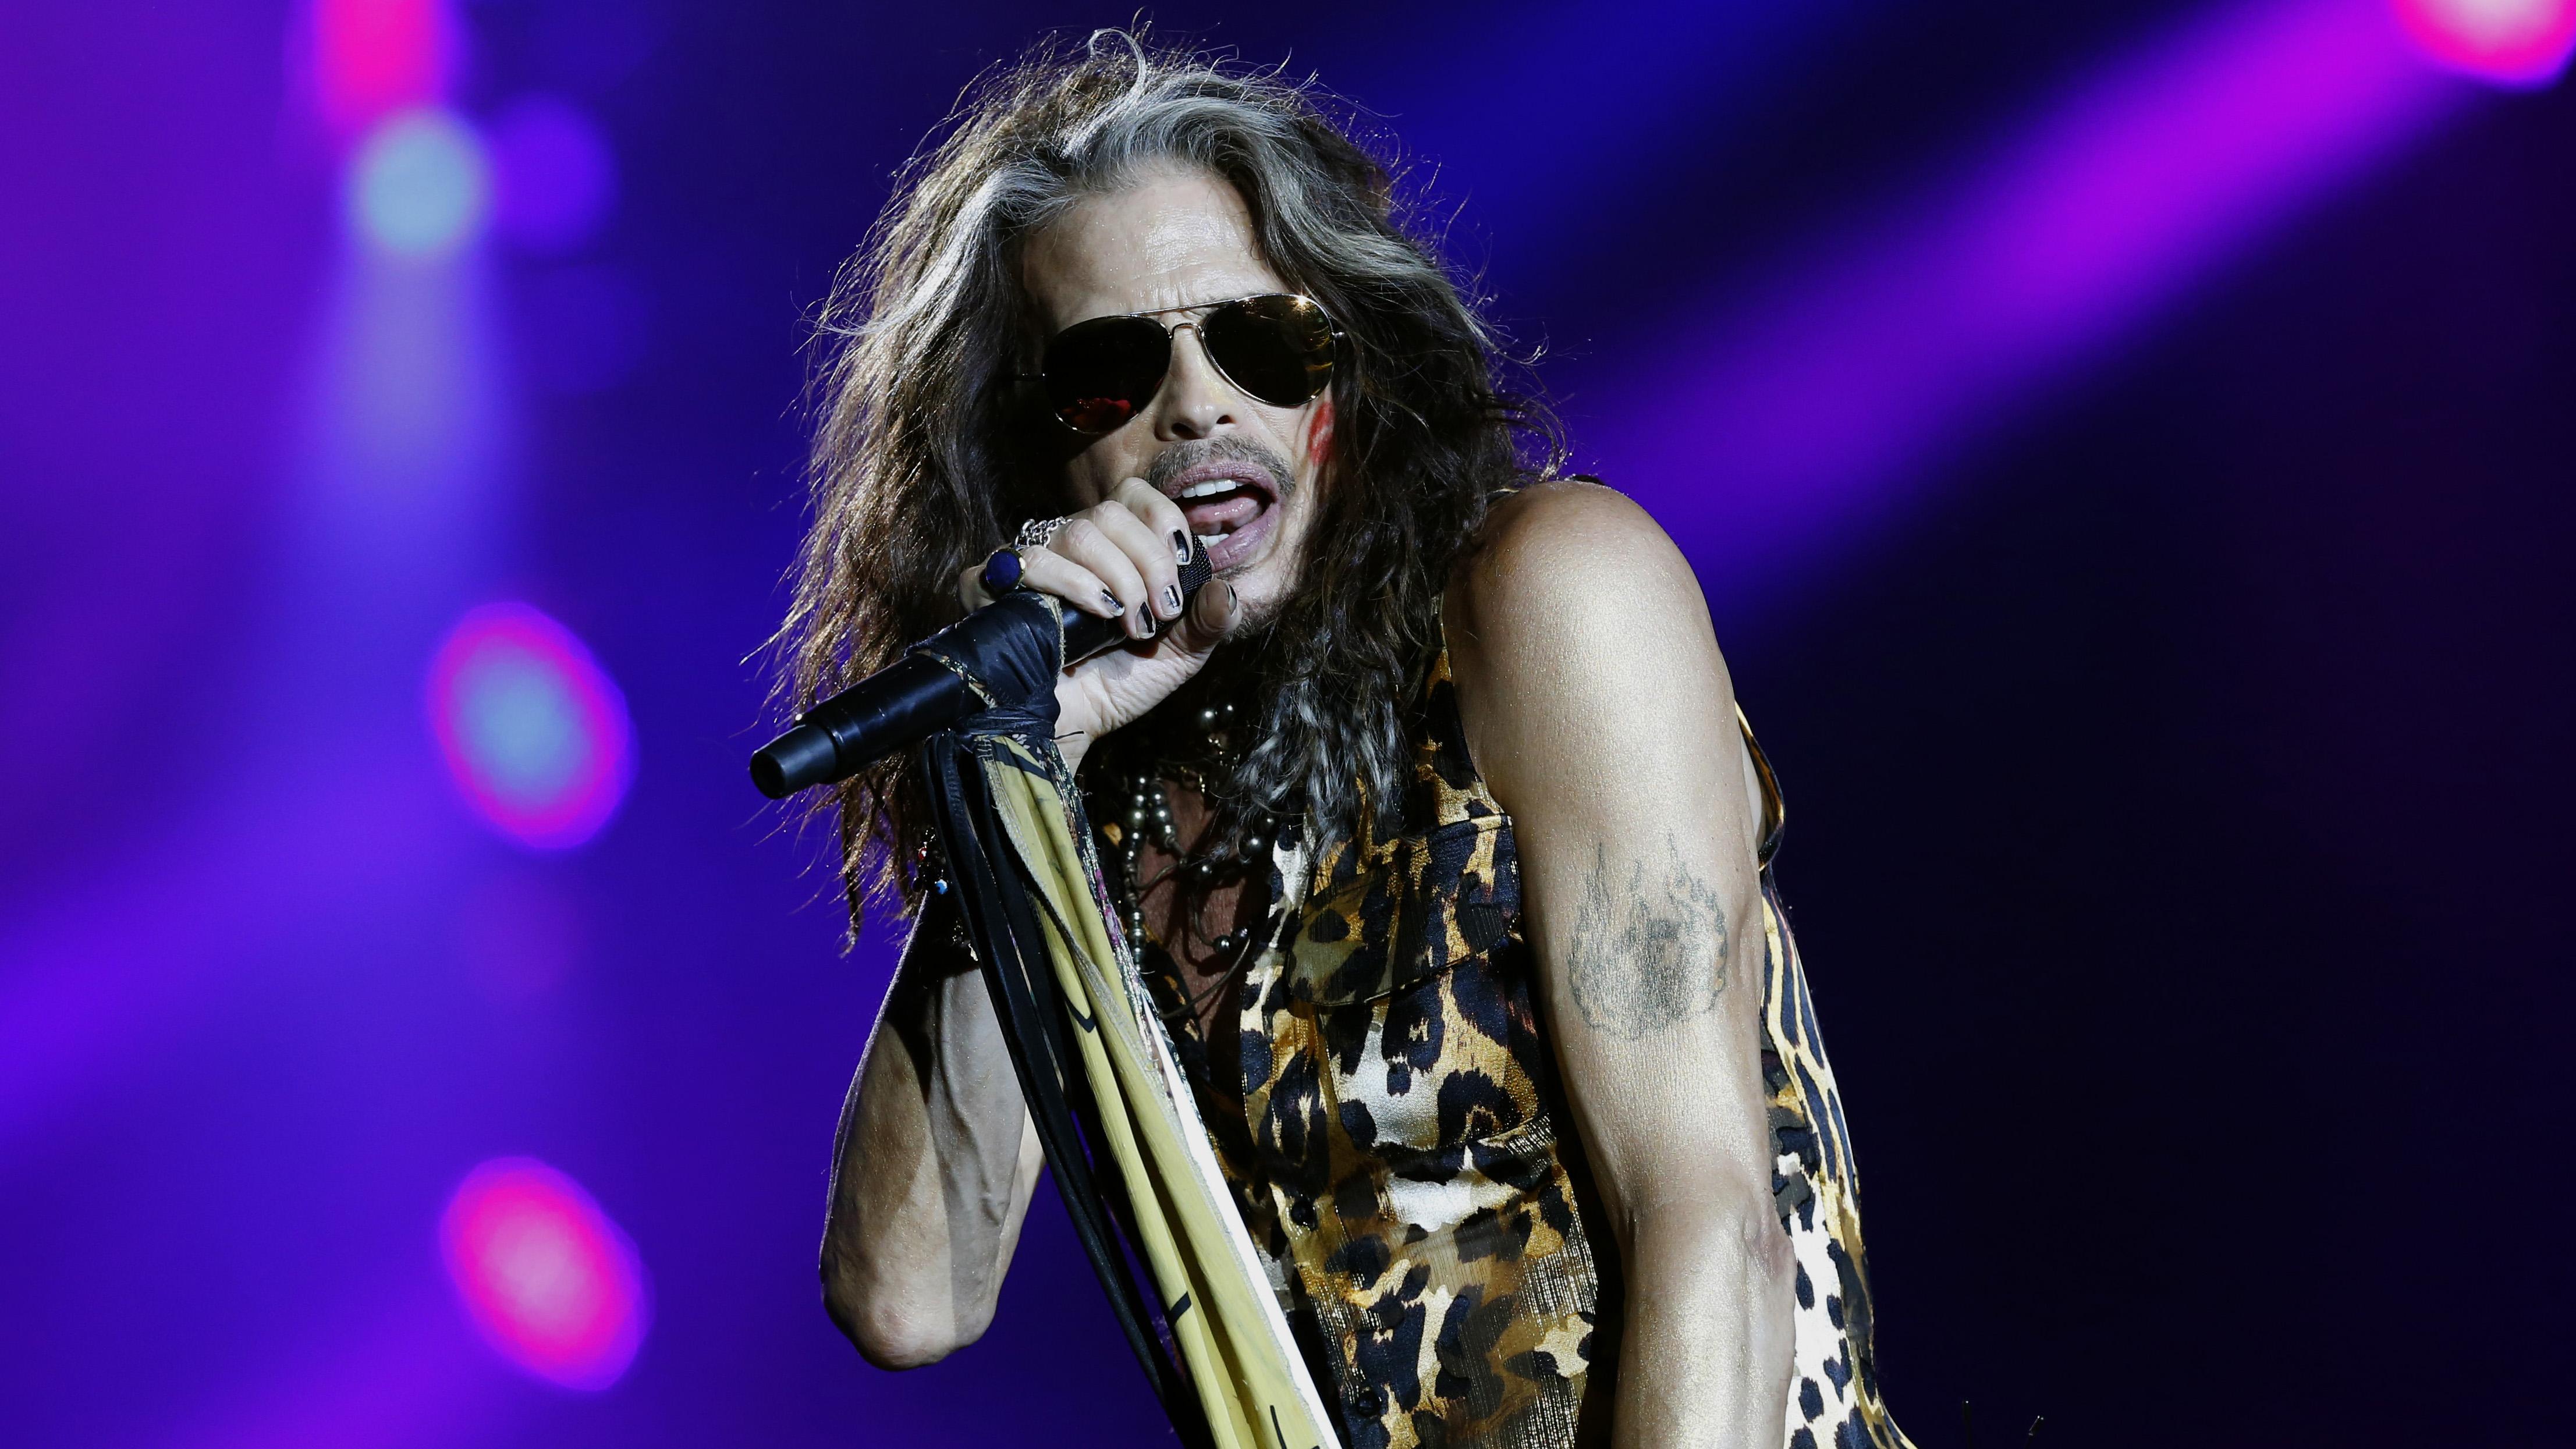 a4a98637e42 Aerosmith Announces Upcoming Las Vegas Residency — Get the Details!